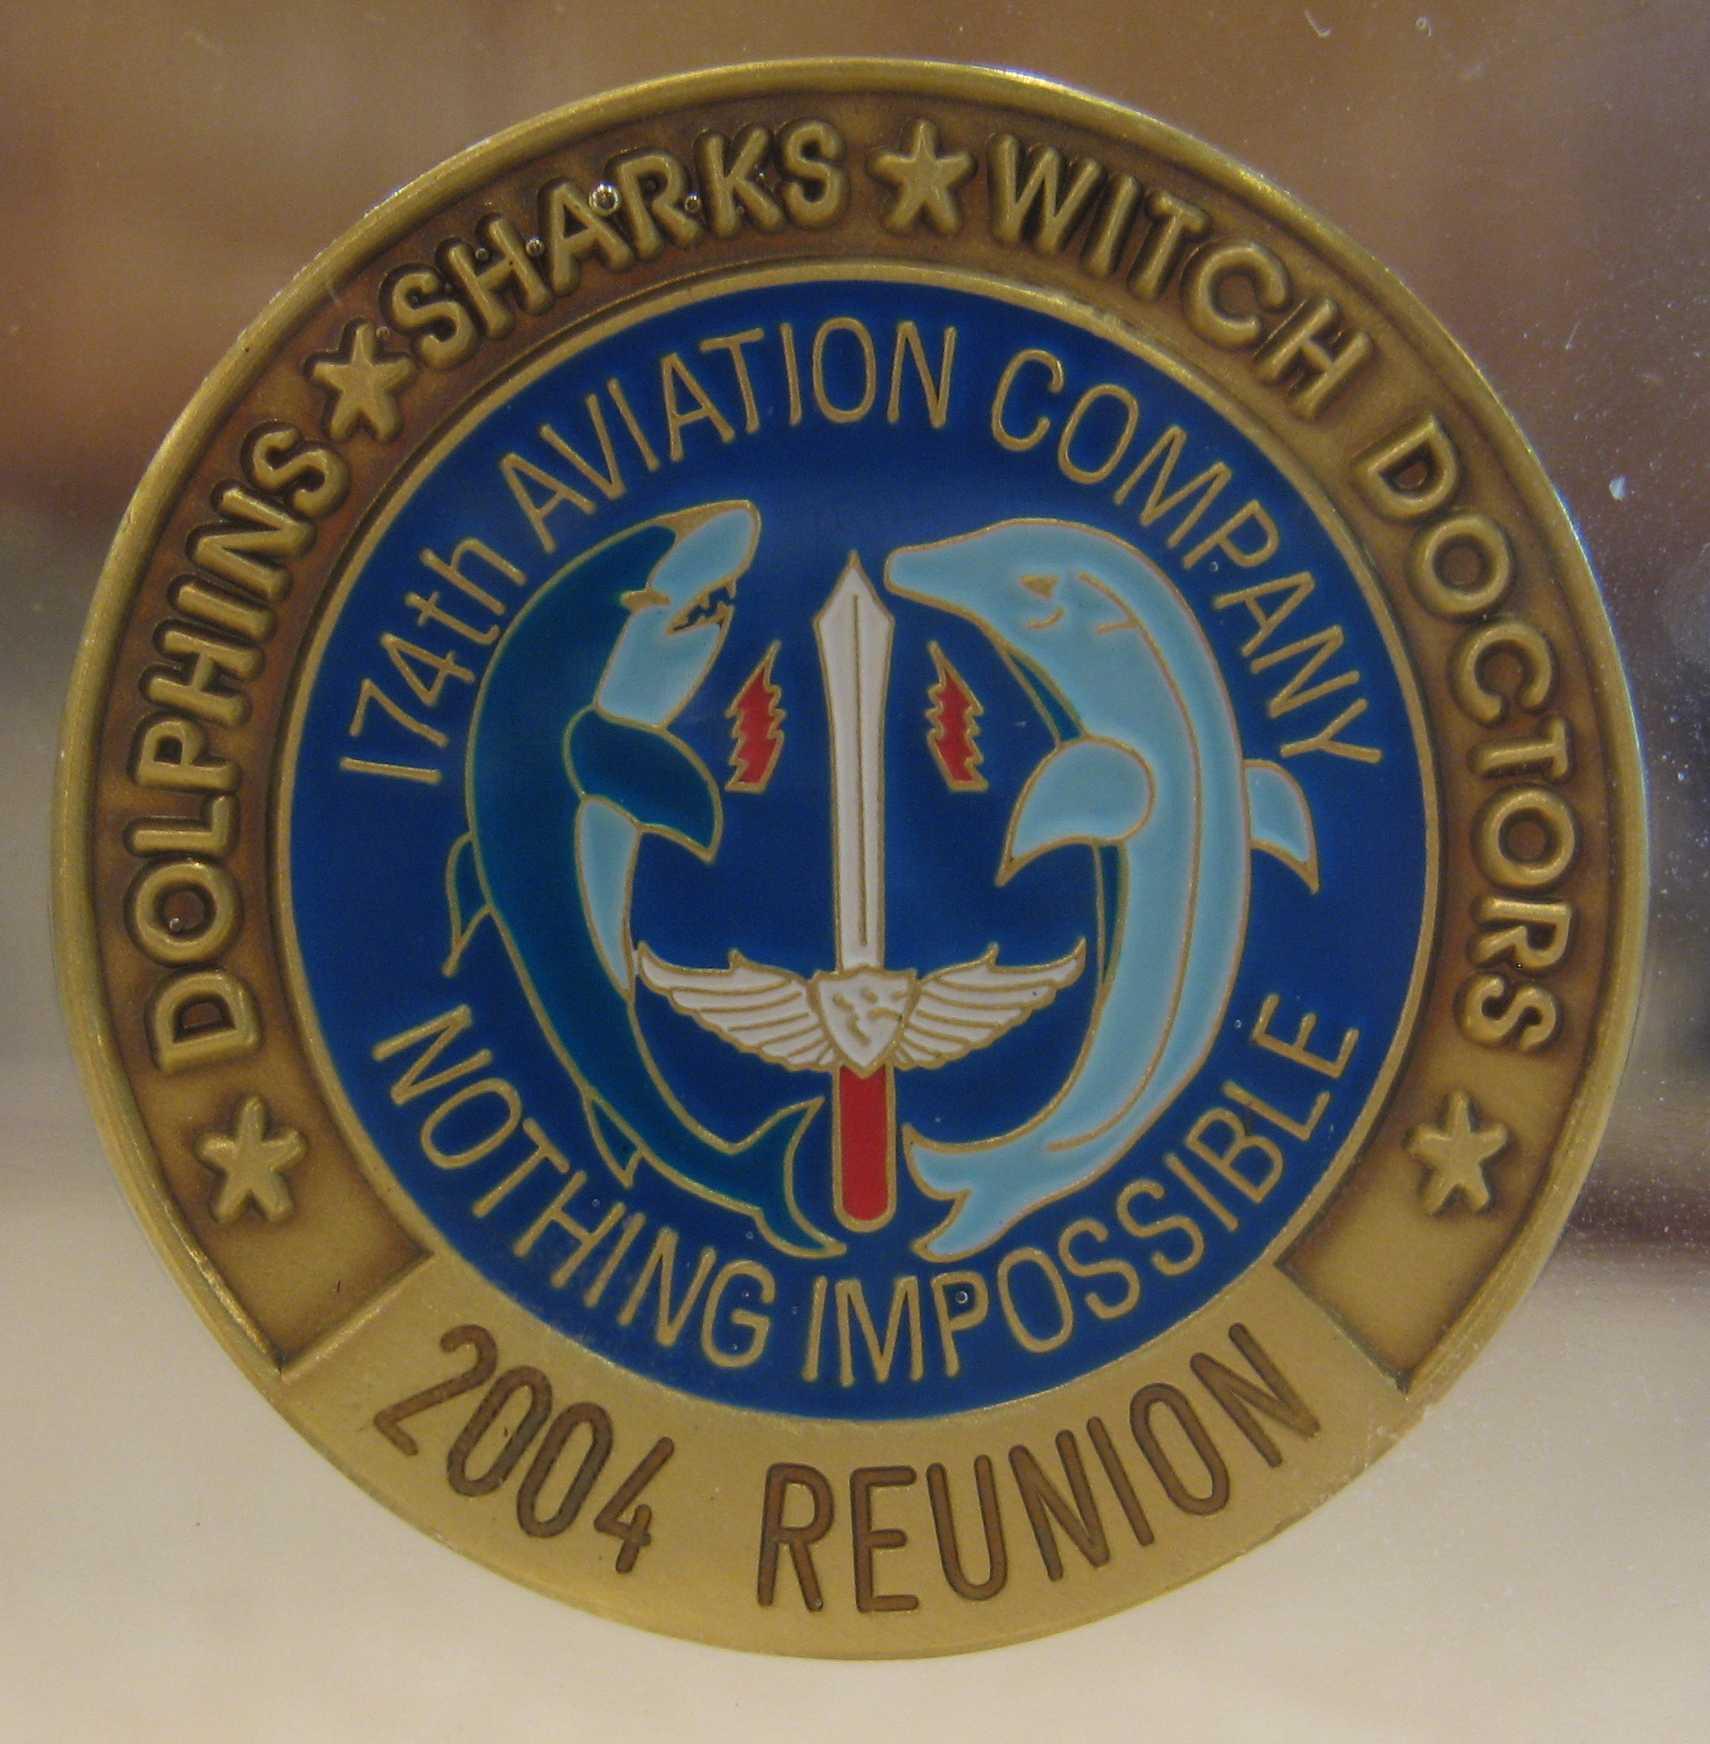 174th ahc 2015 reunion - 174th Ahc Challenge Coins